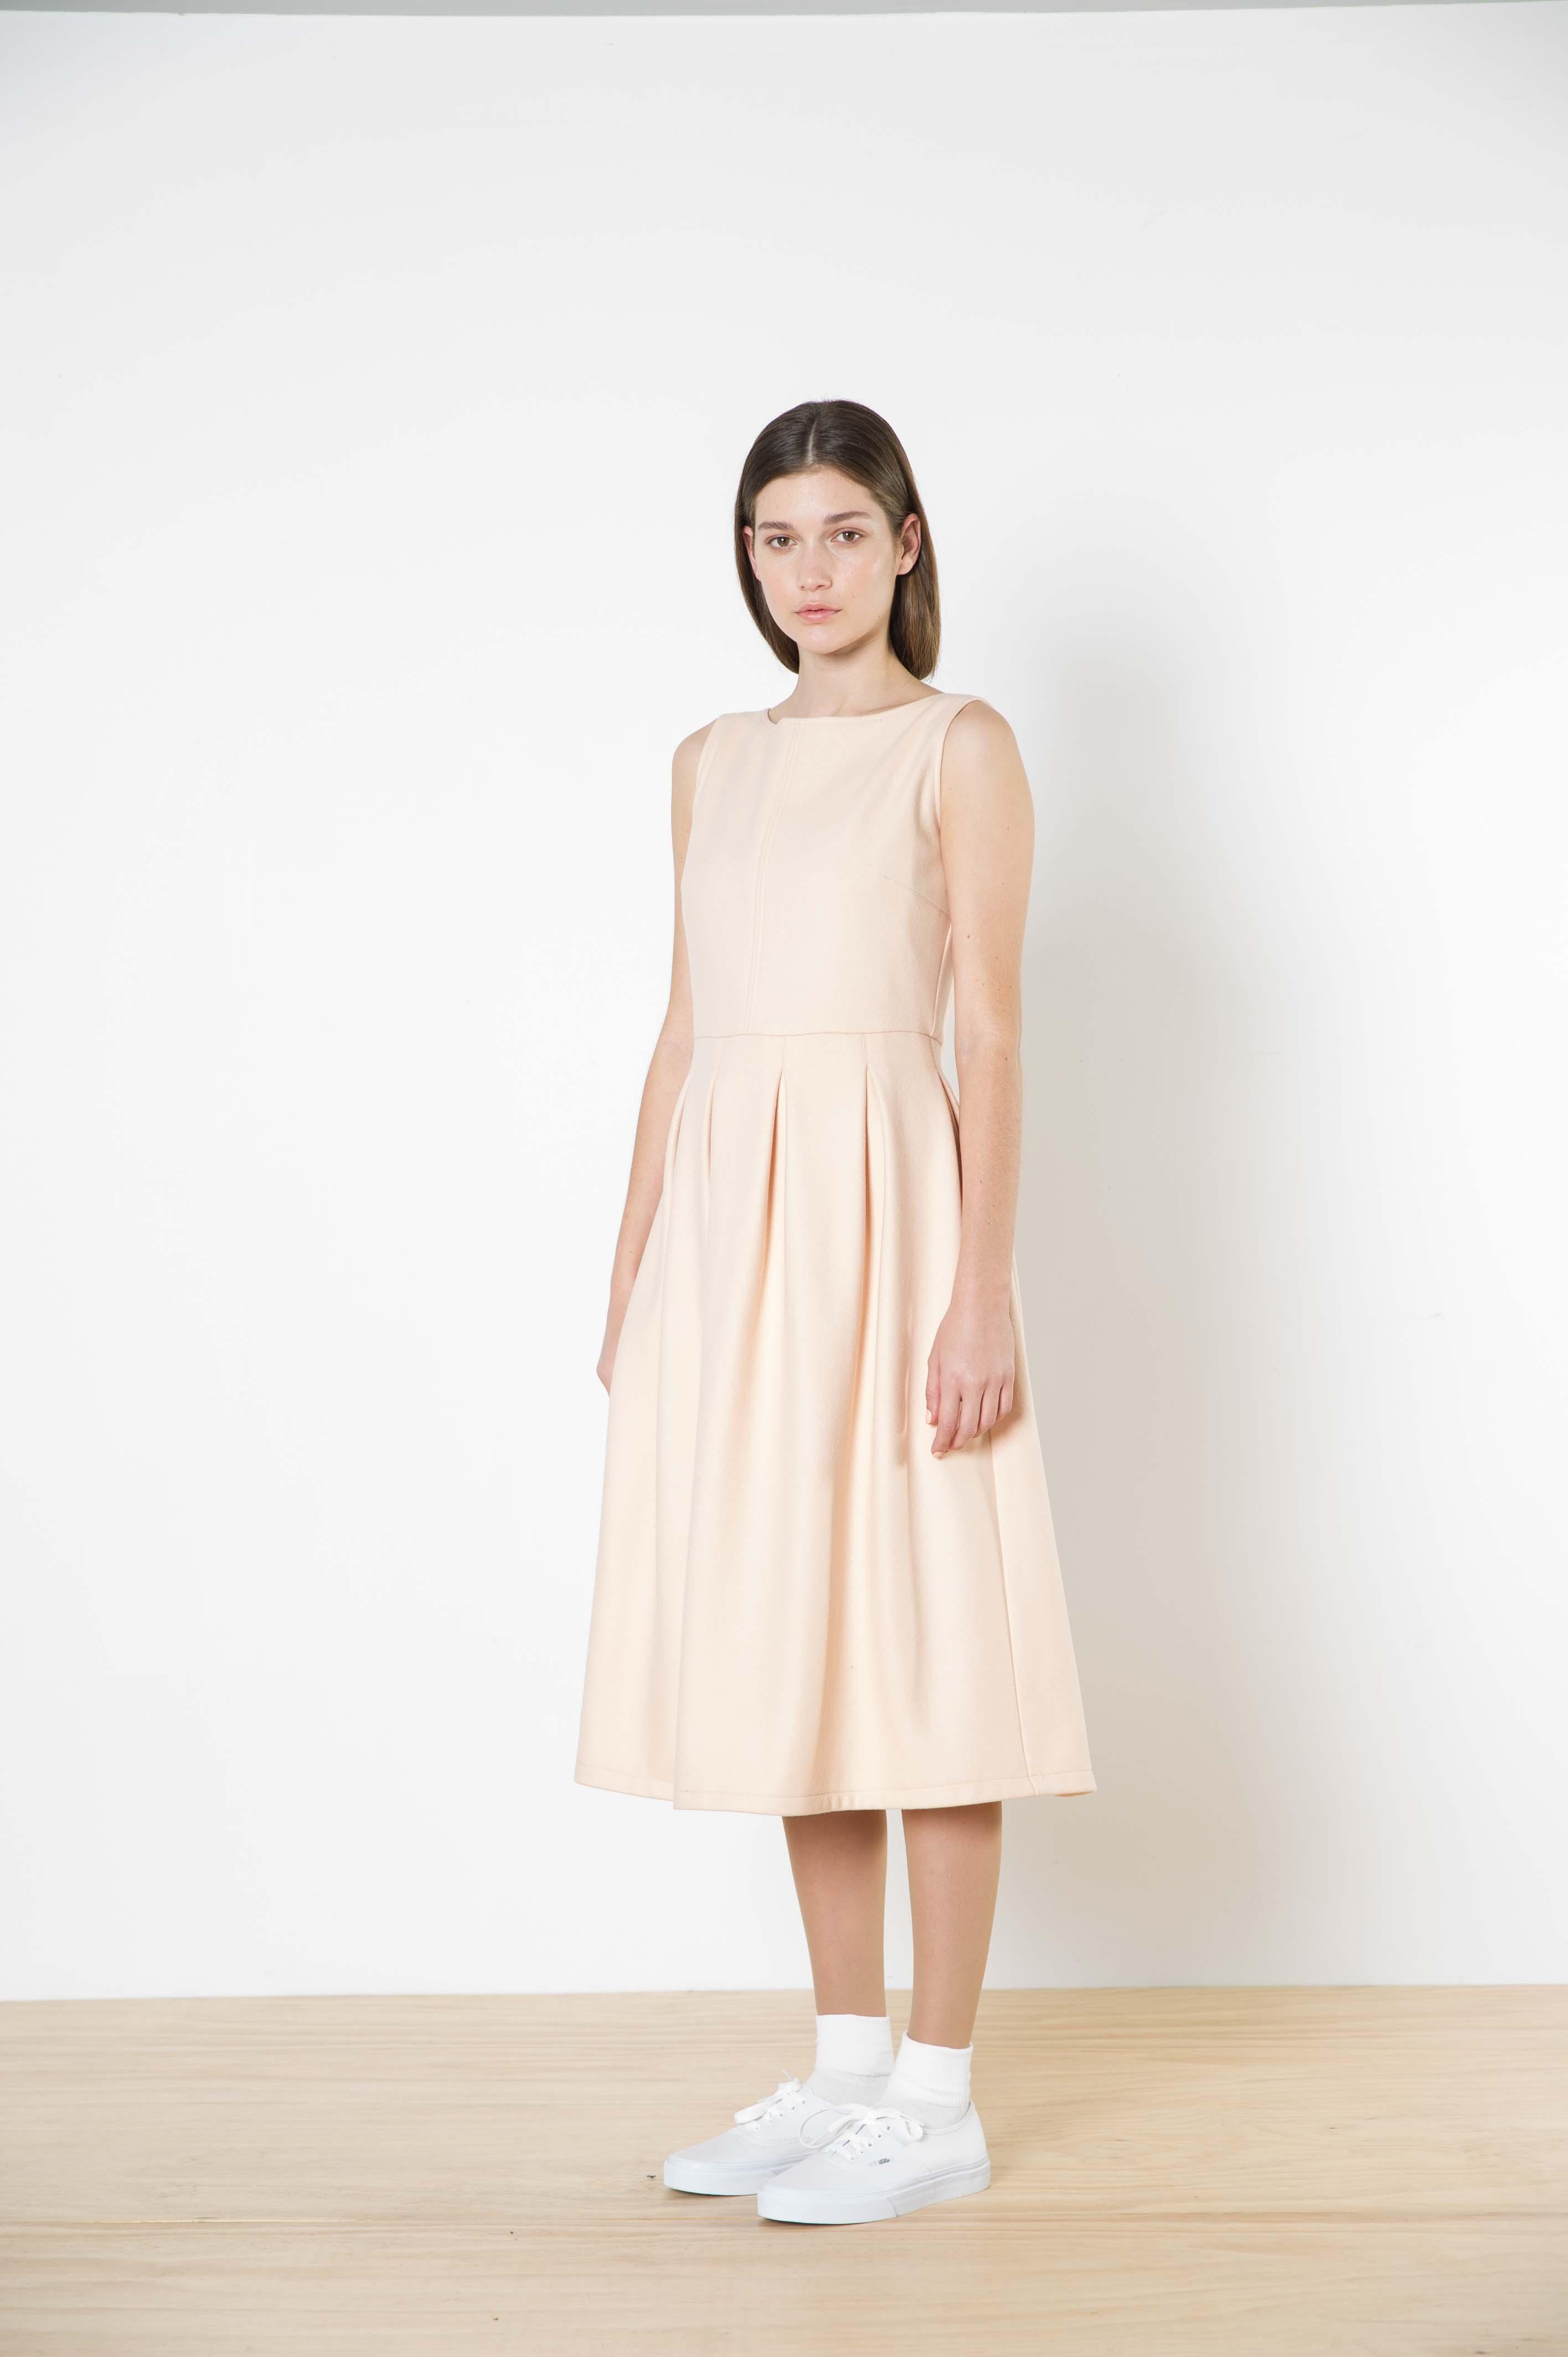 04 artemisia wool dress